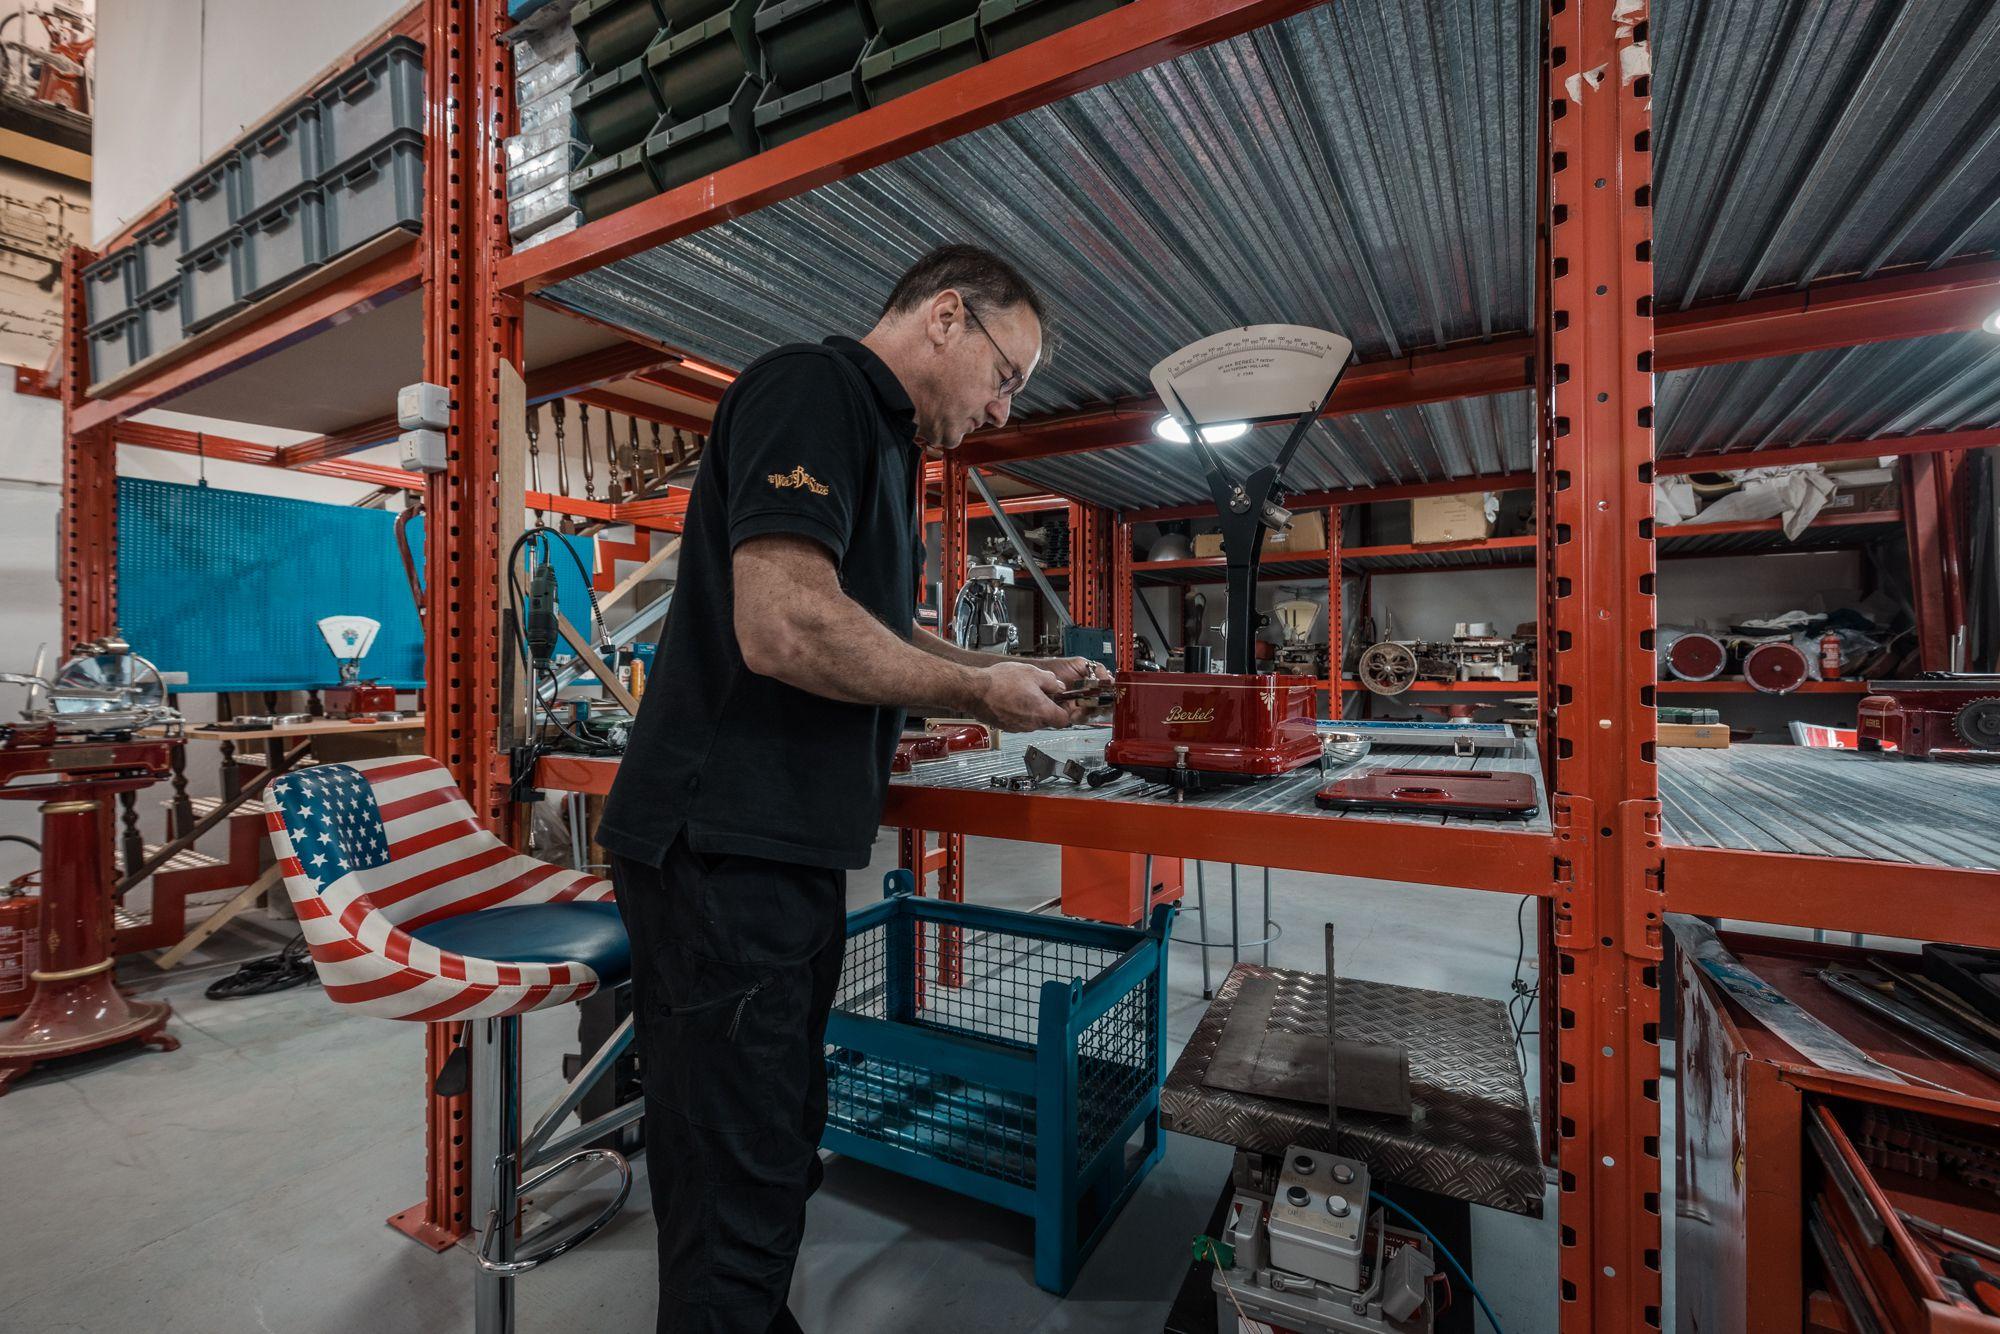 ER5_8266 Our restoration laboratory